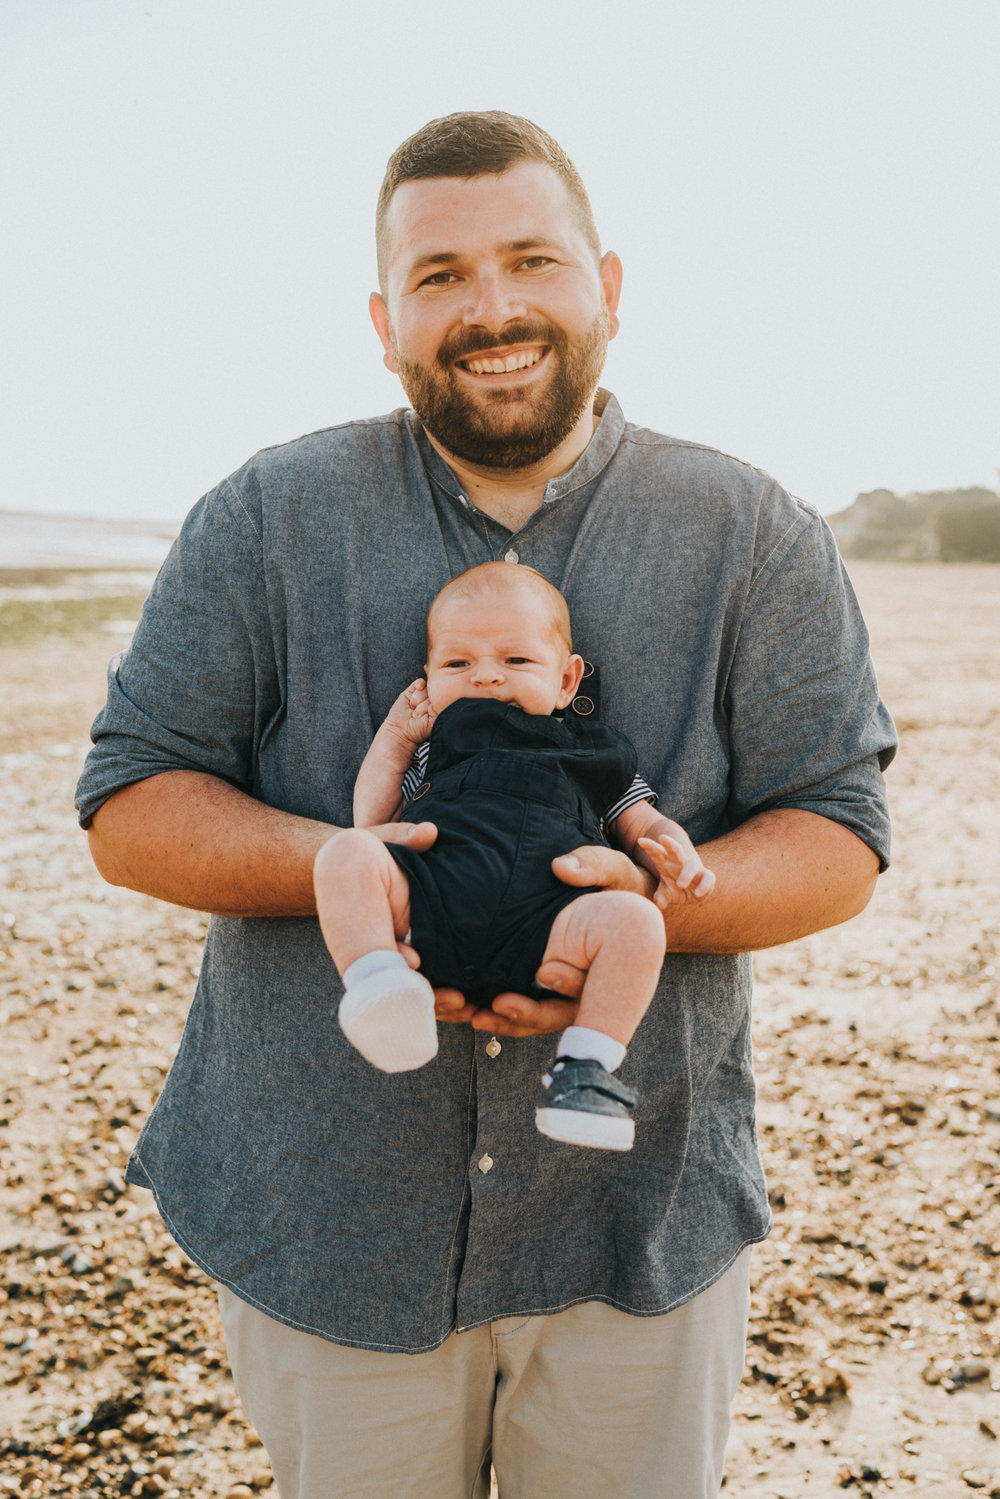 Newborn-Baby-Cooper-Grace-Elizabeth-Alternative-Wedding-Photographer-Colchester-Essex-Mersea-Island-32.jpg